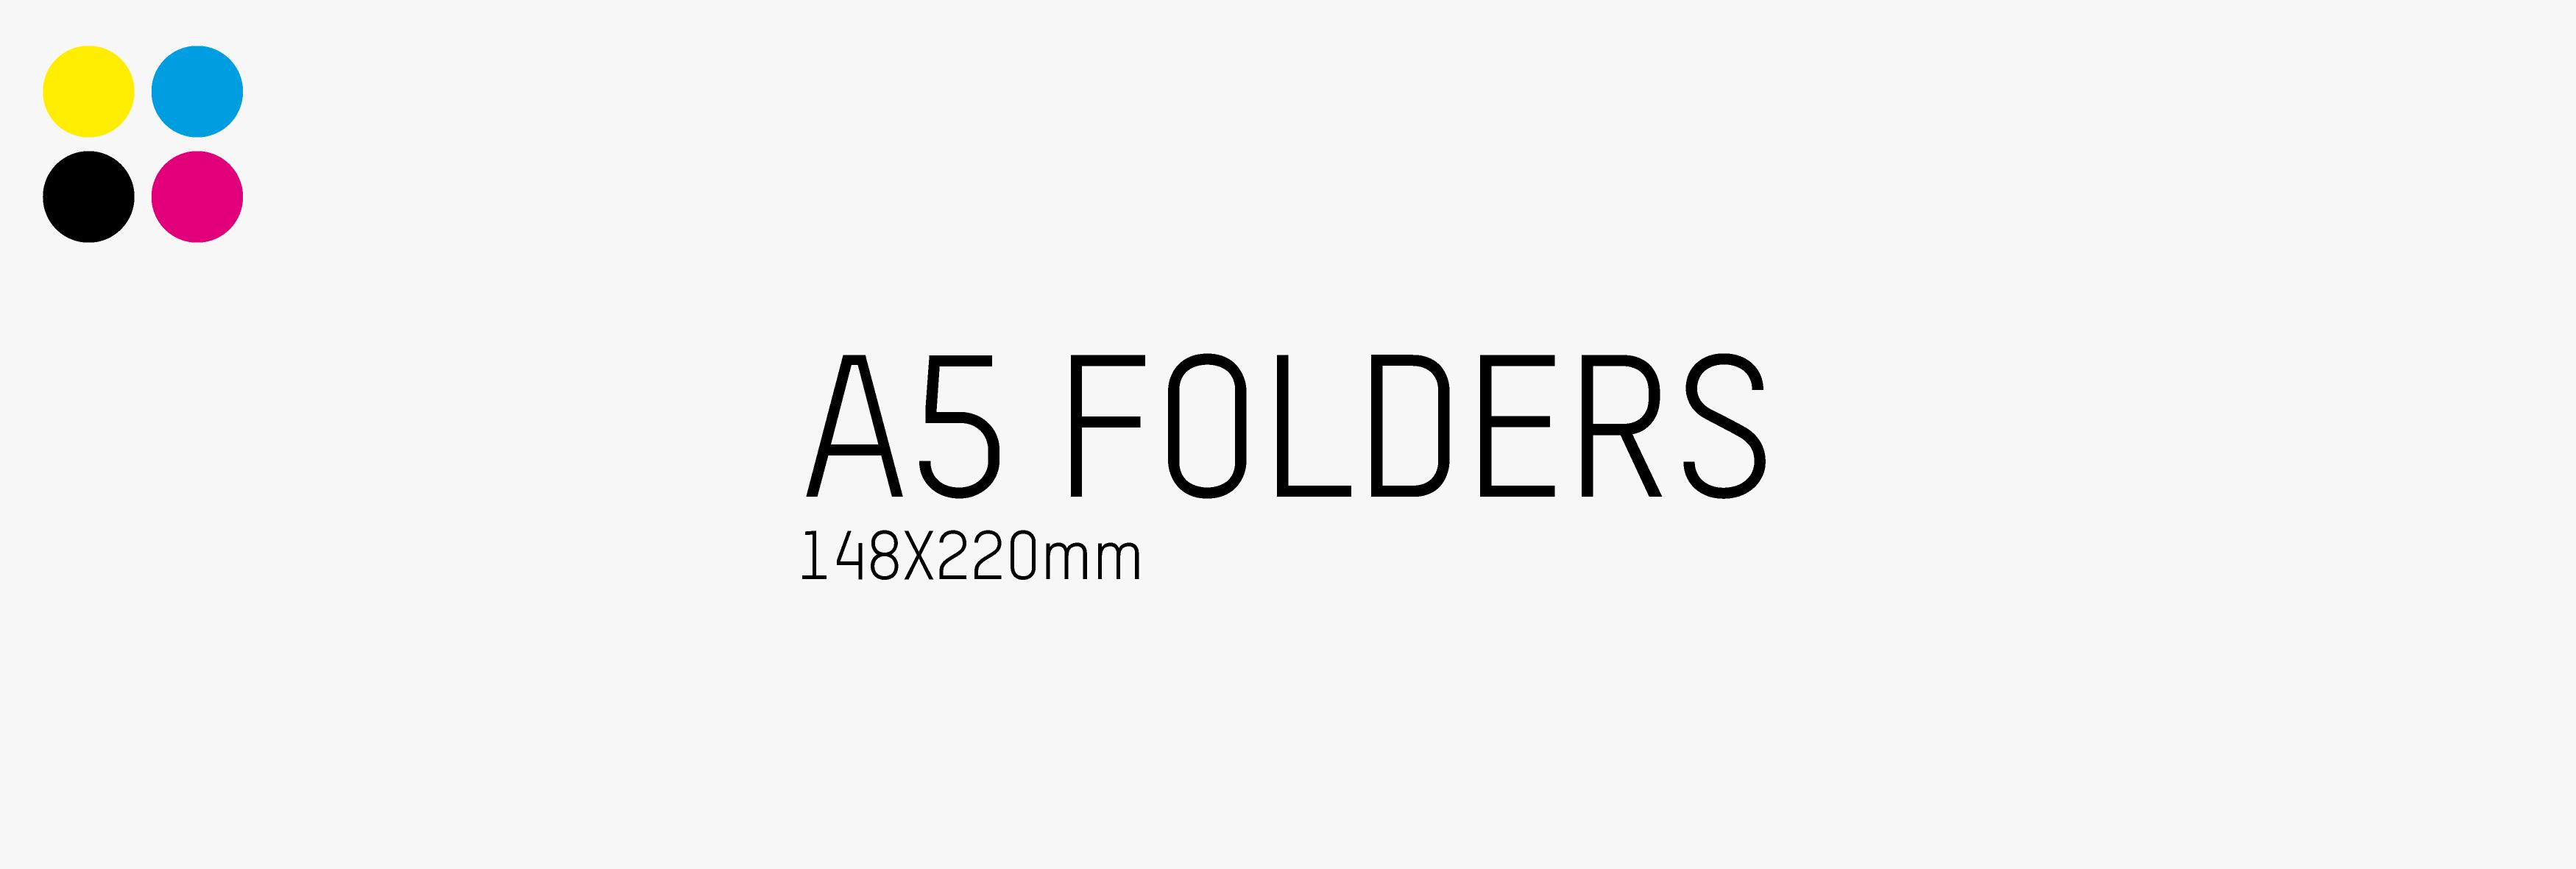 A5-folders